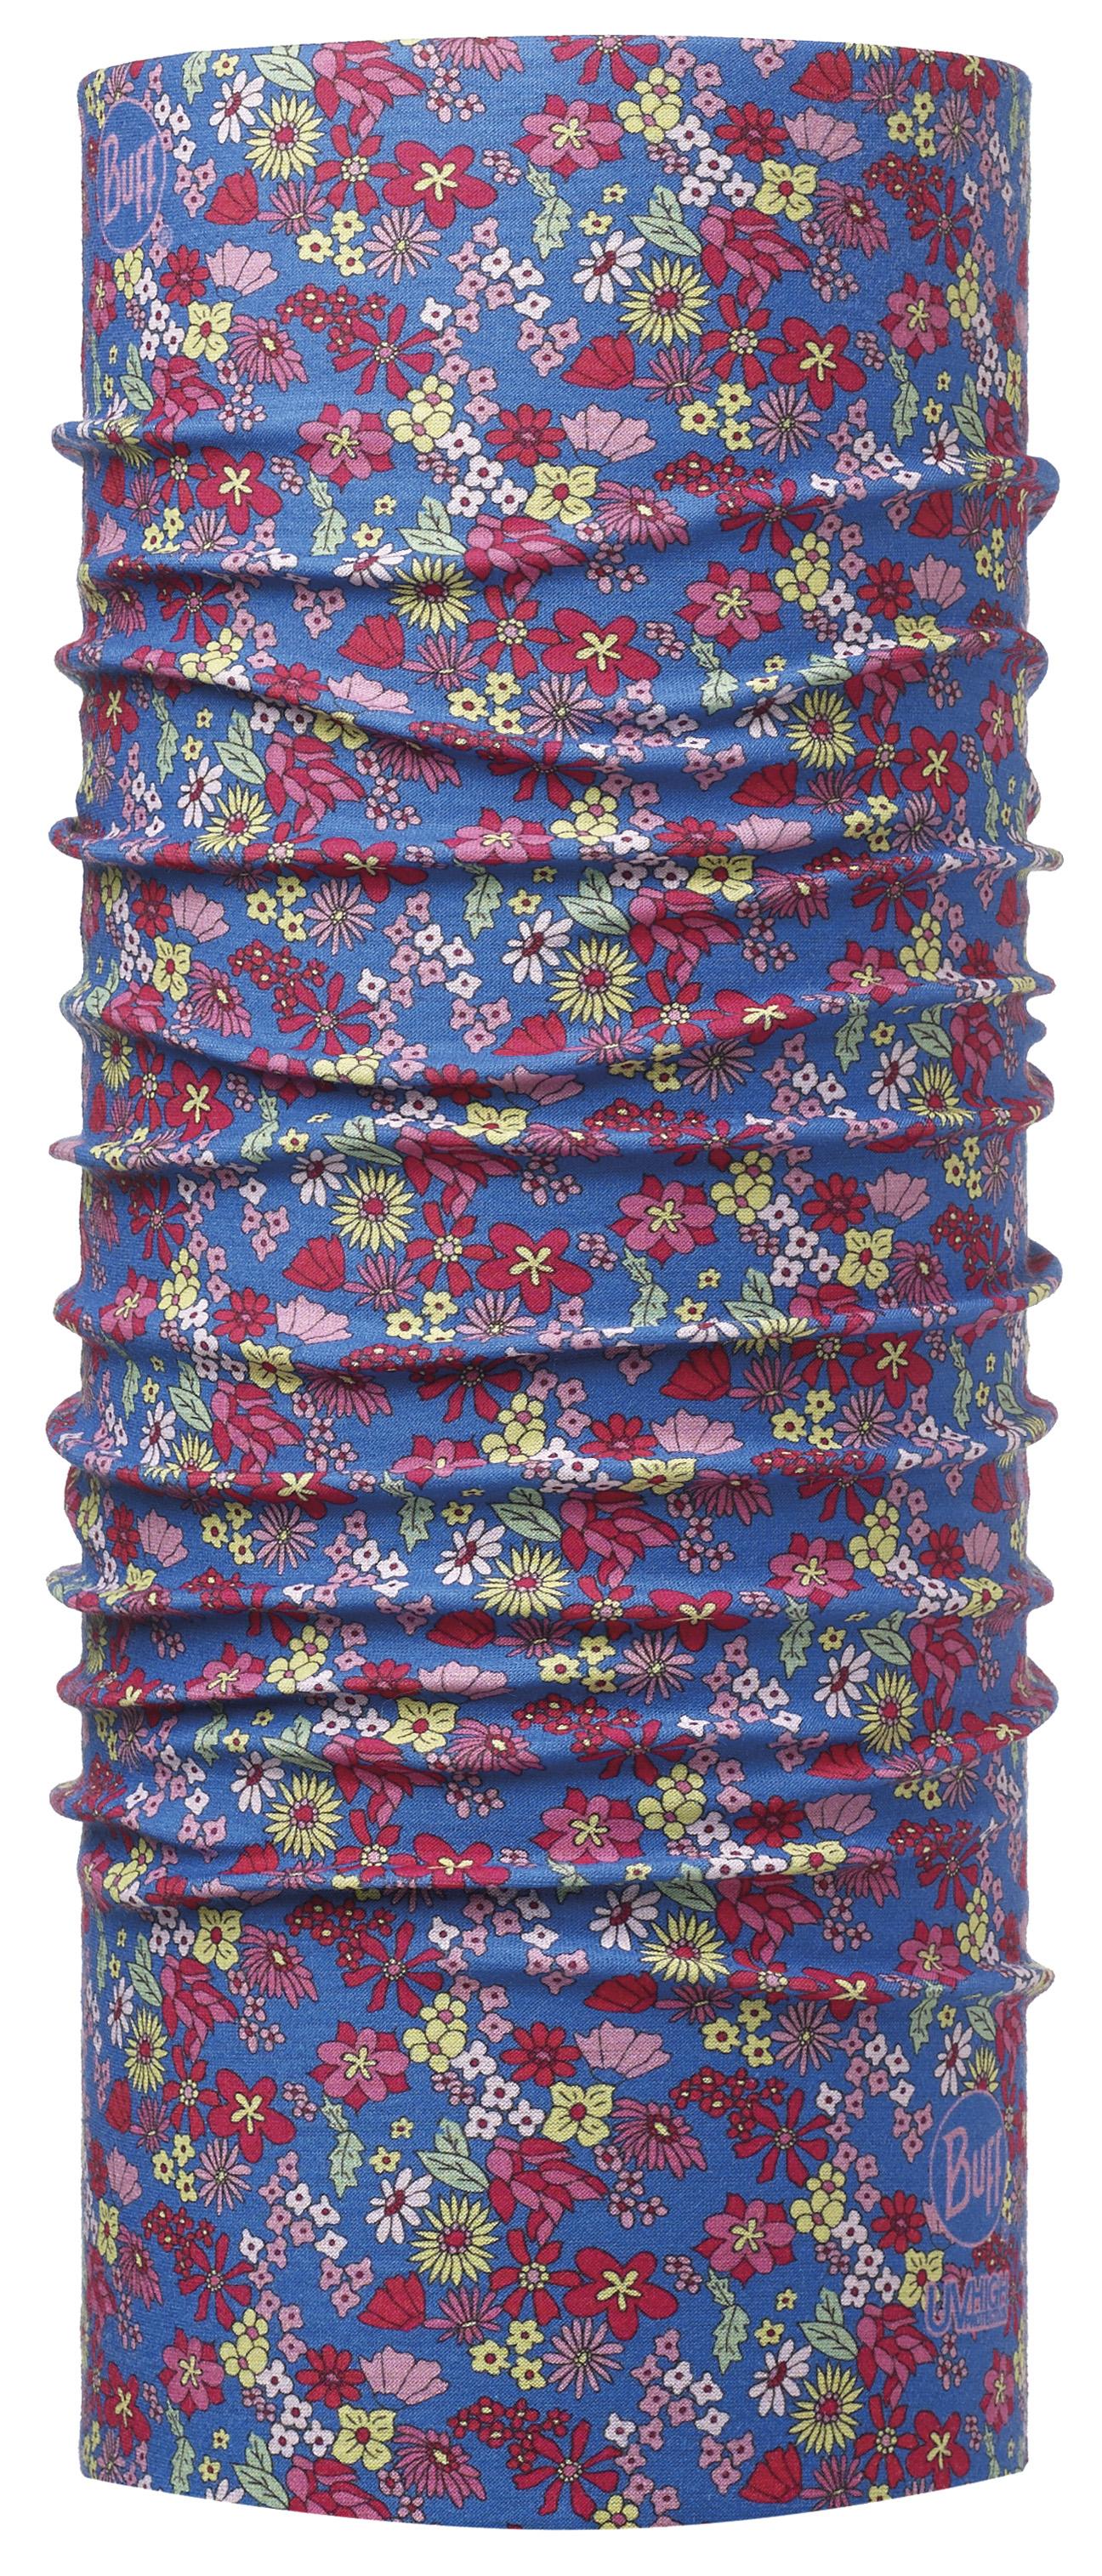 Купить Бандана BUFF High UV Protection JUNIOR HIGH FLOWERING MULTI Детская одежда 1185737